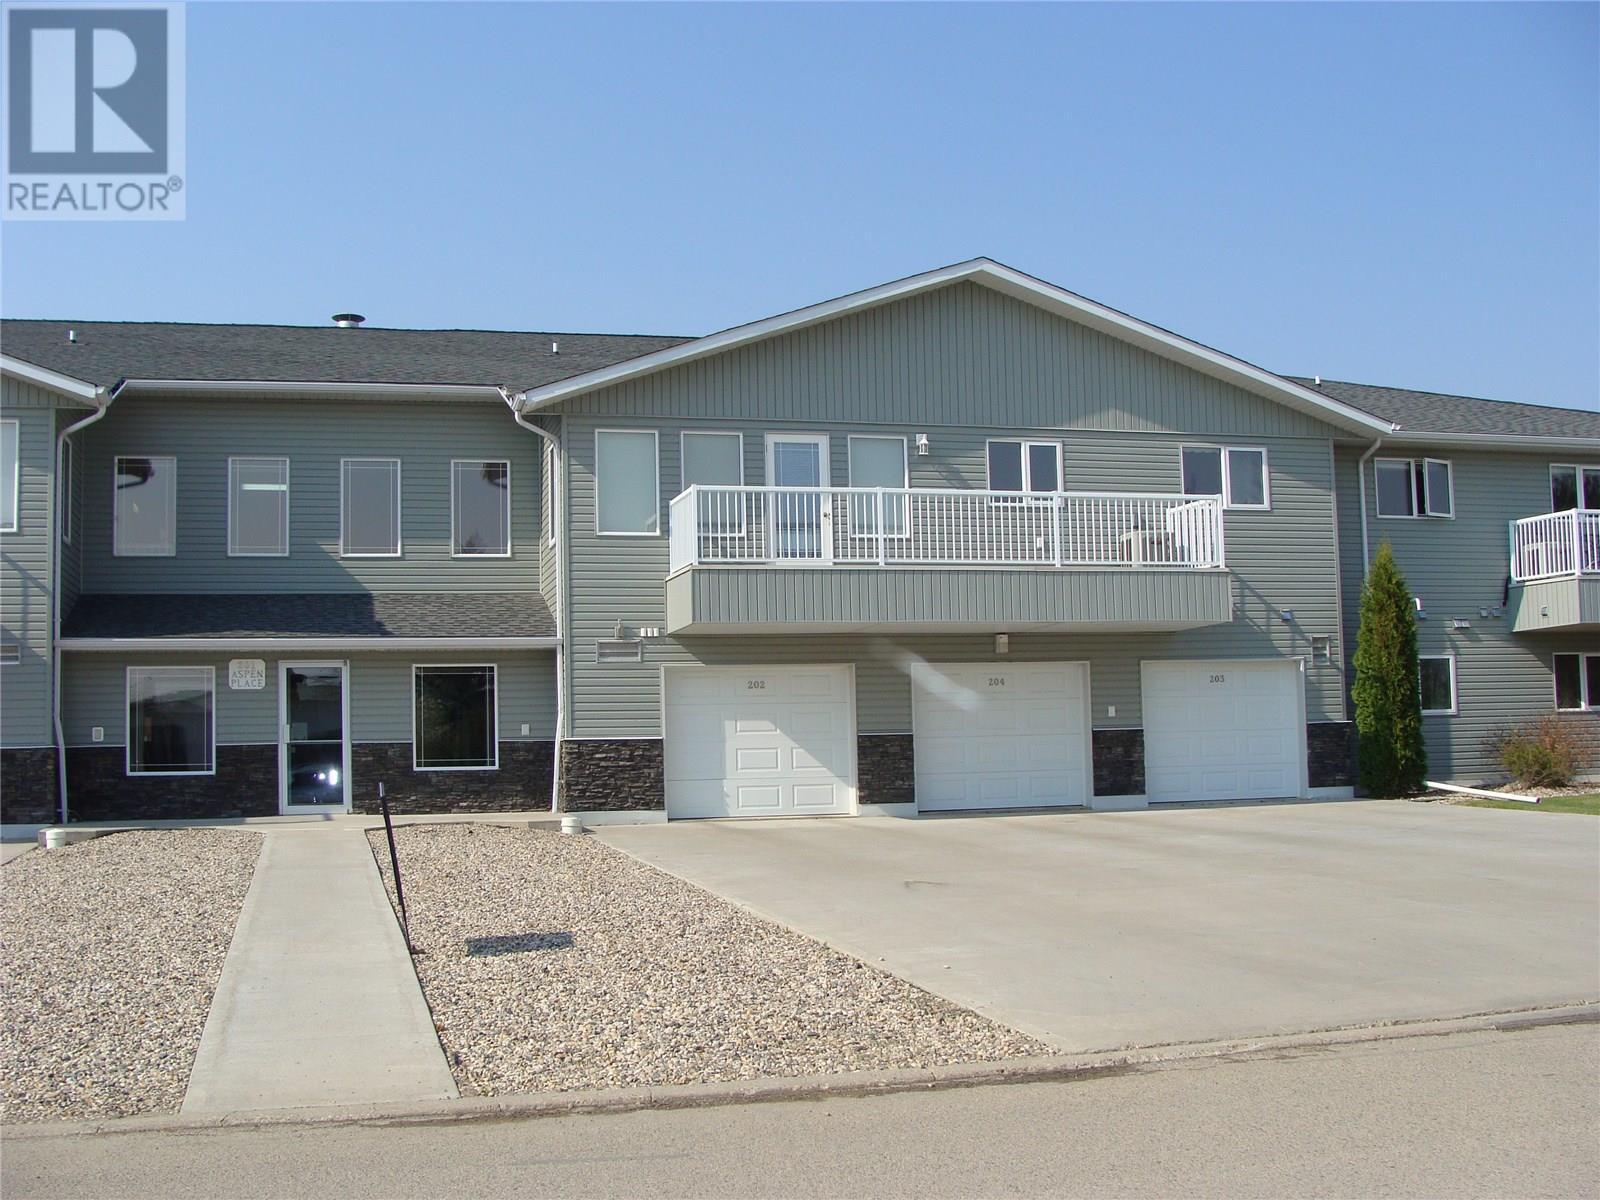 203 201 8th AVE E, watrous, Saskatchewan